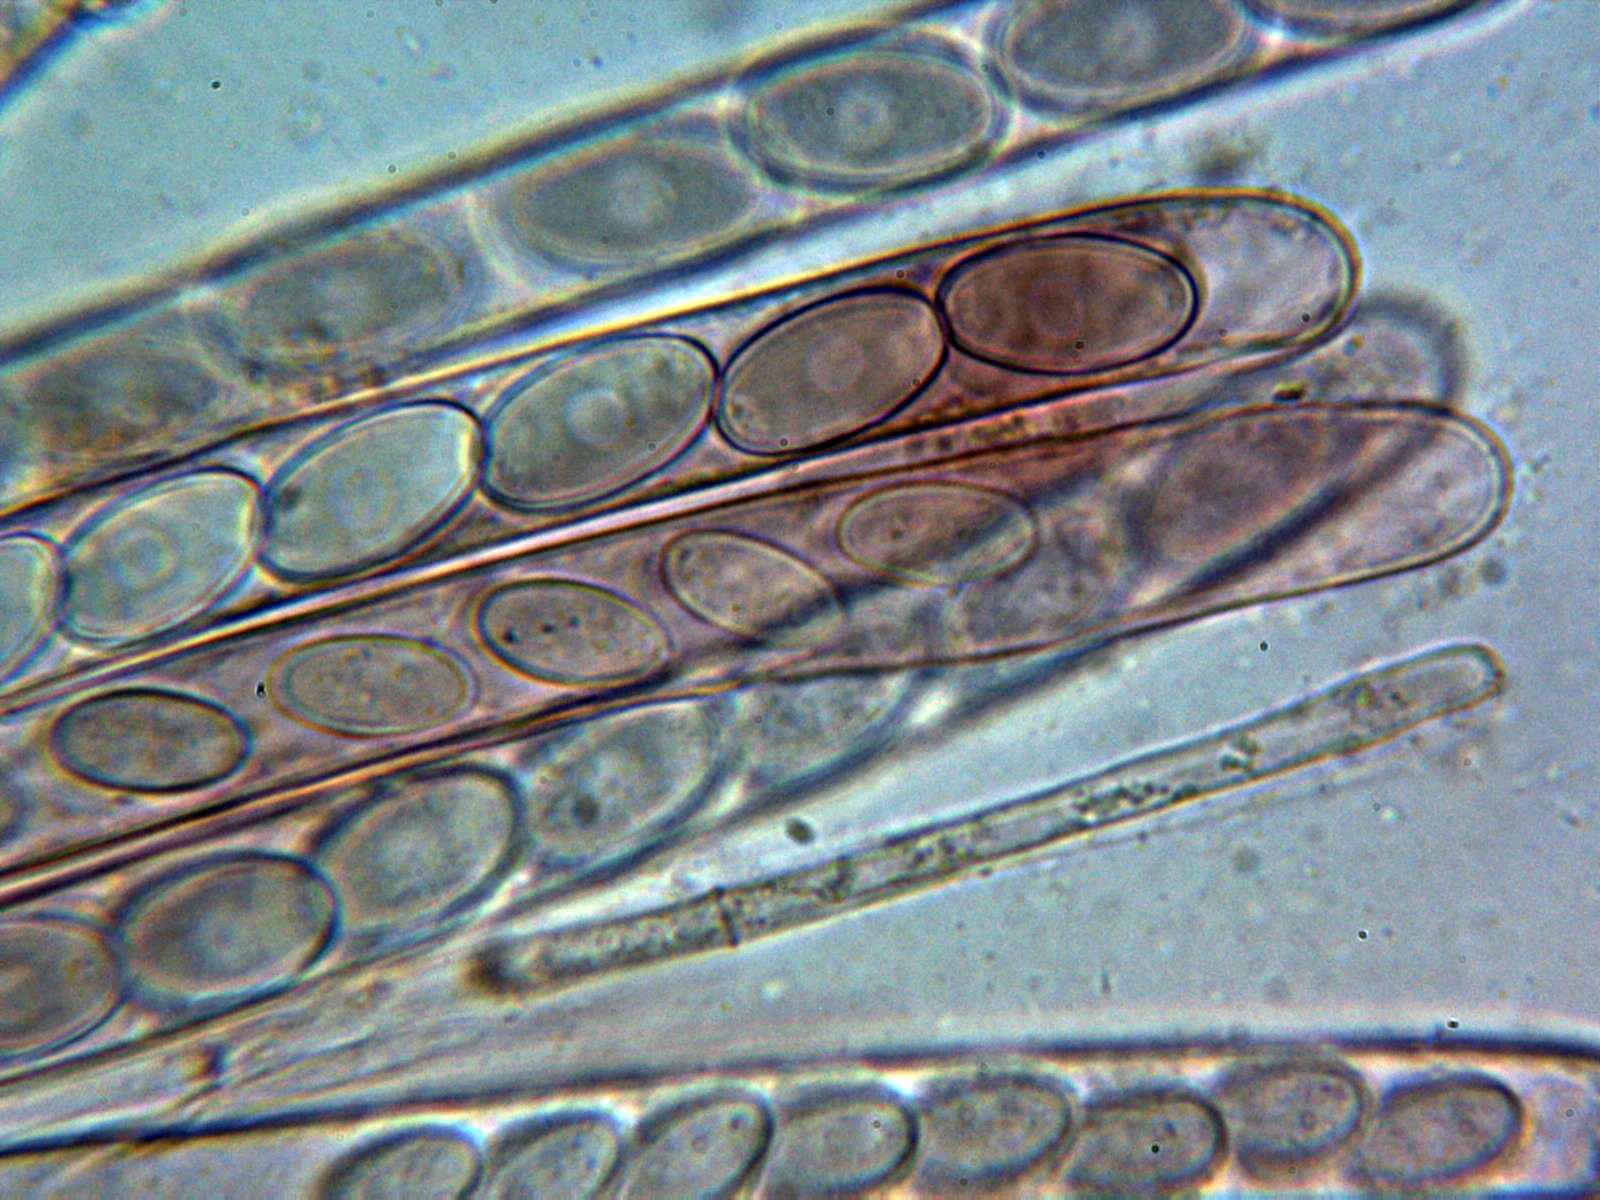 15-Ascosyparfisis2.jpg